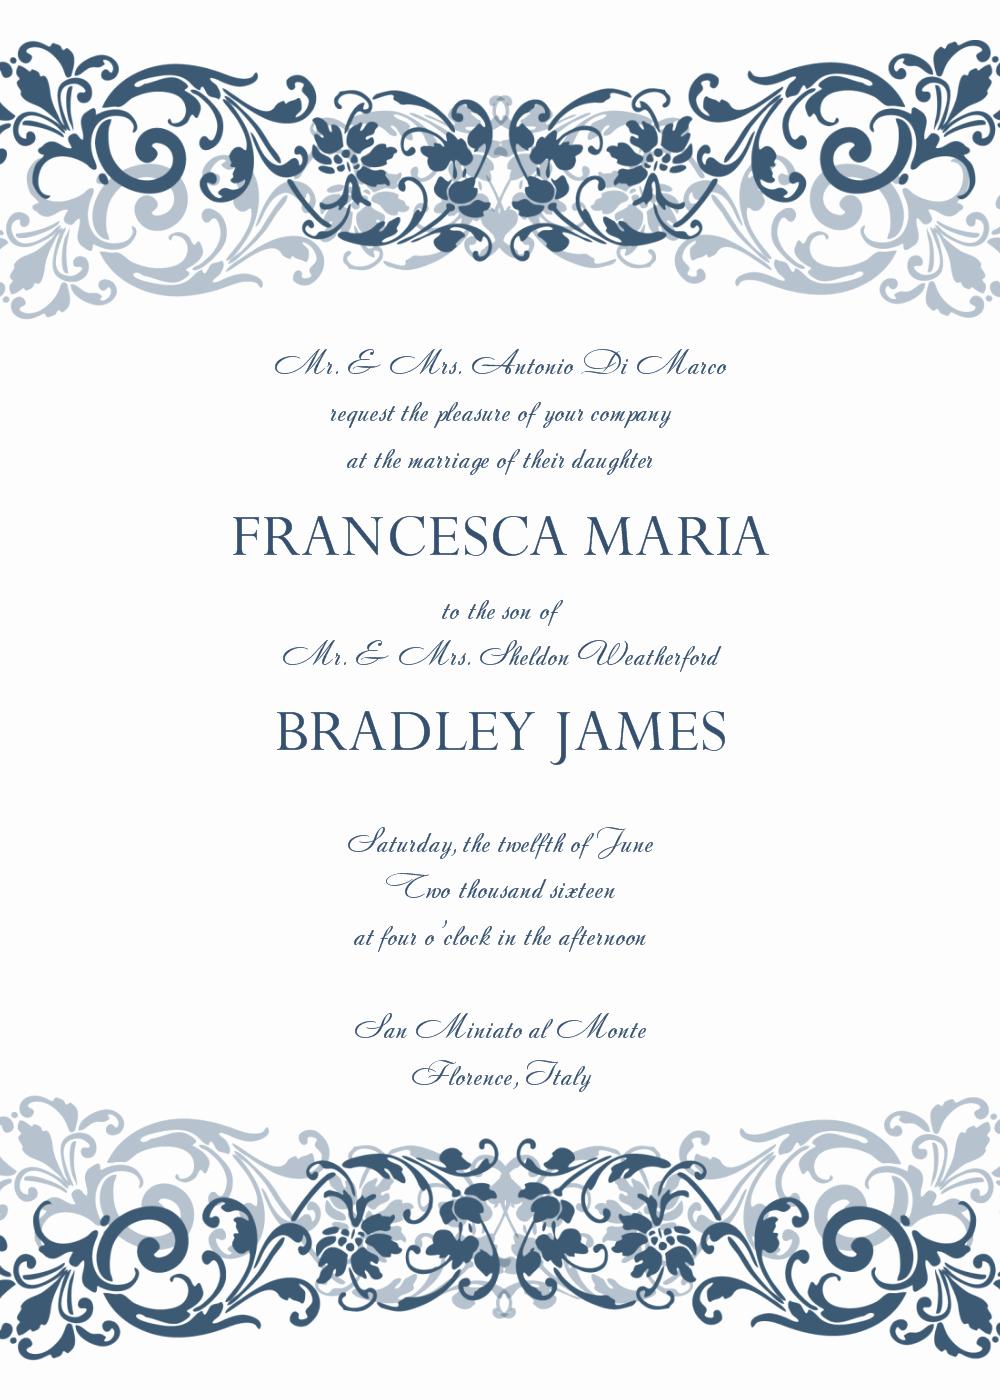 Ms Office Invitation Template Elegant 8 Free Wedding Invitation Templates Excel Pdf formats